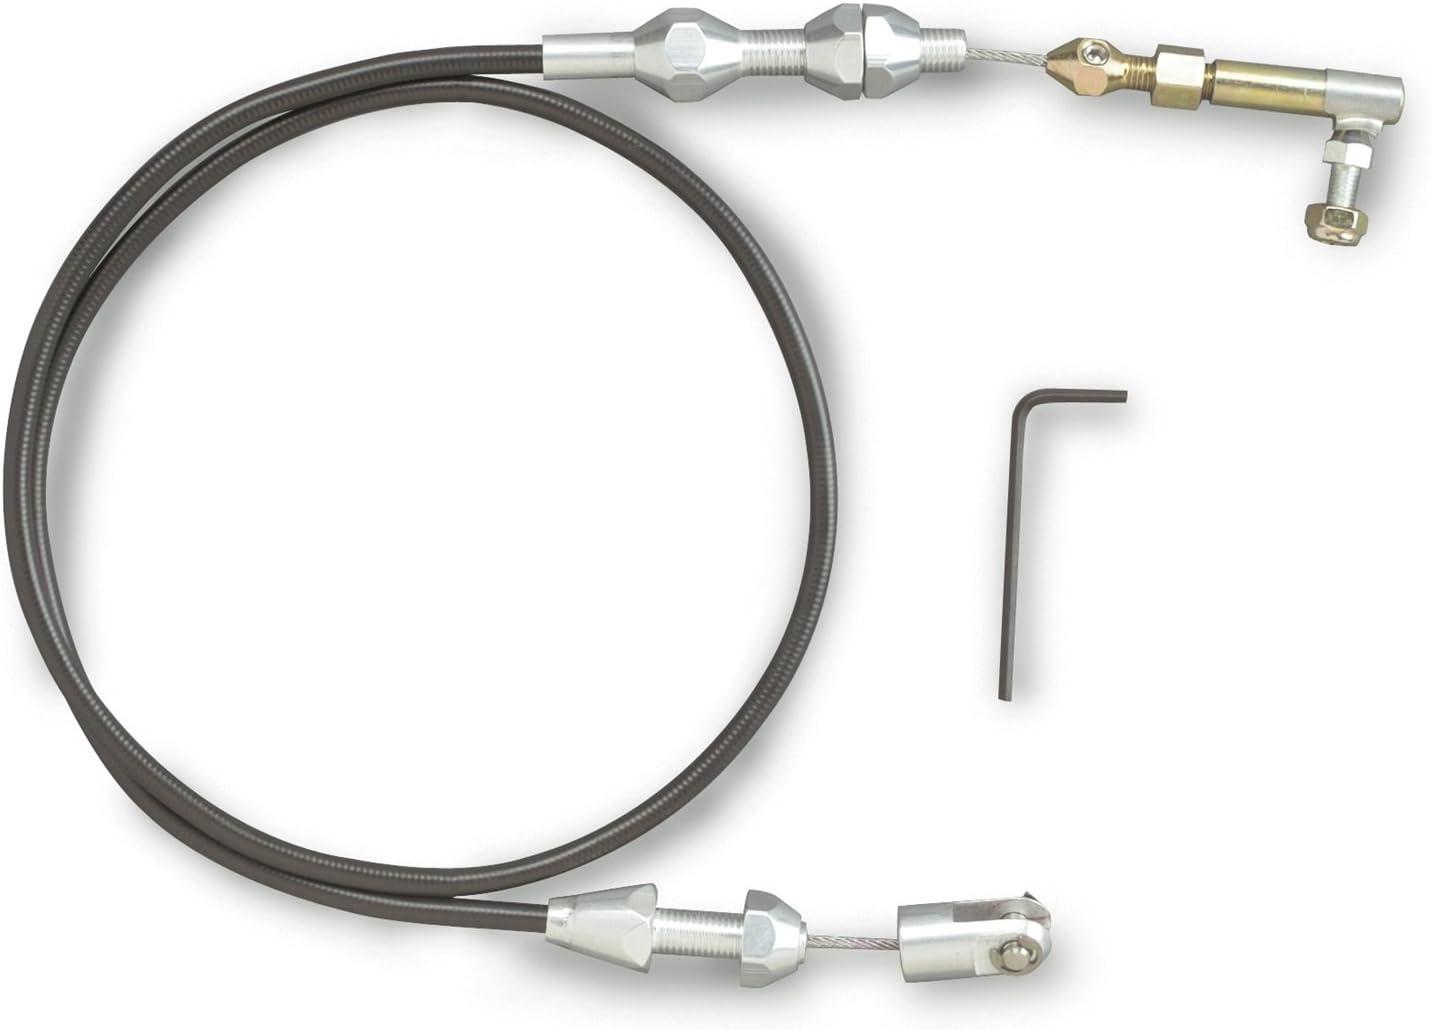 Chevy Mopar-Black Ford Black Street Rod AluminumThrottle Gas Pedal